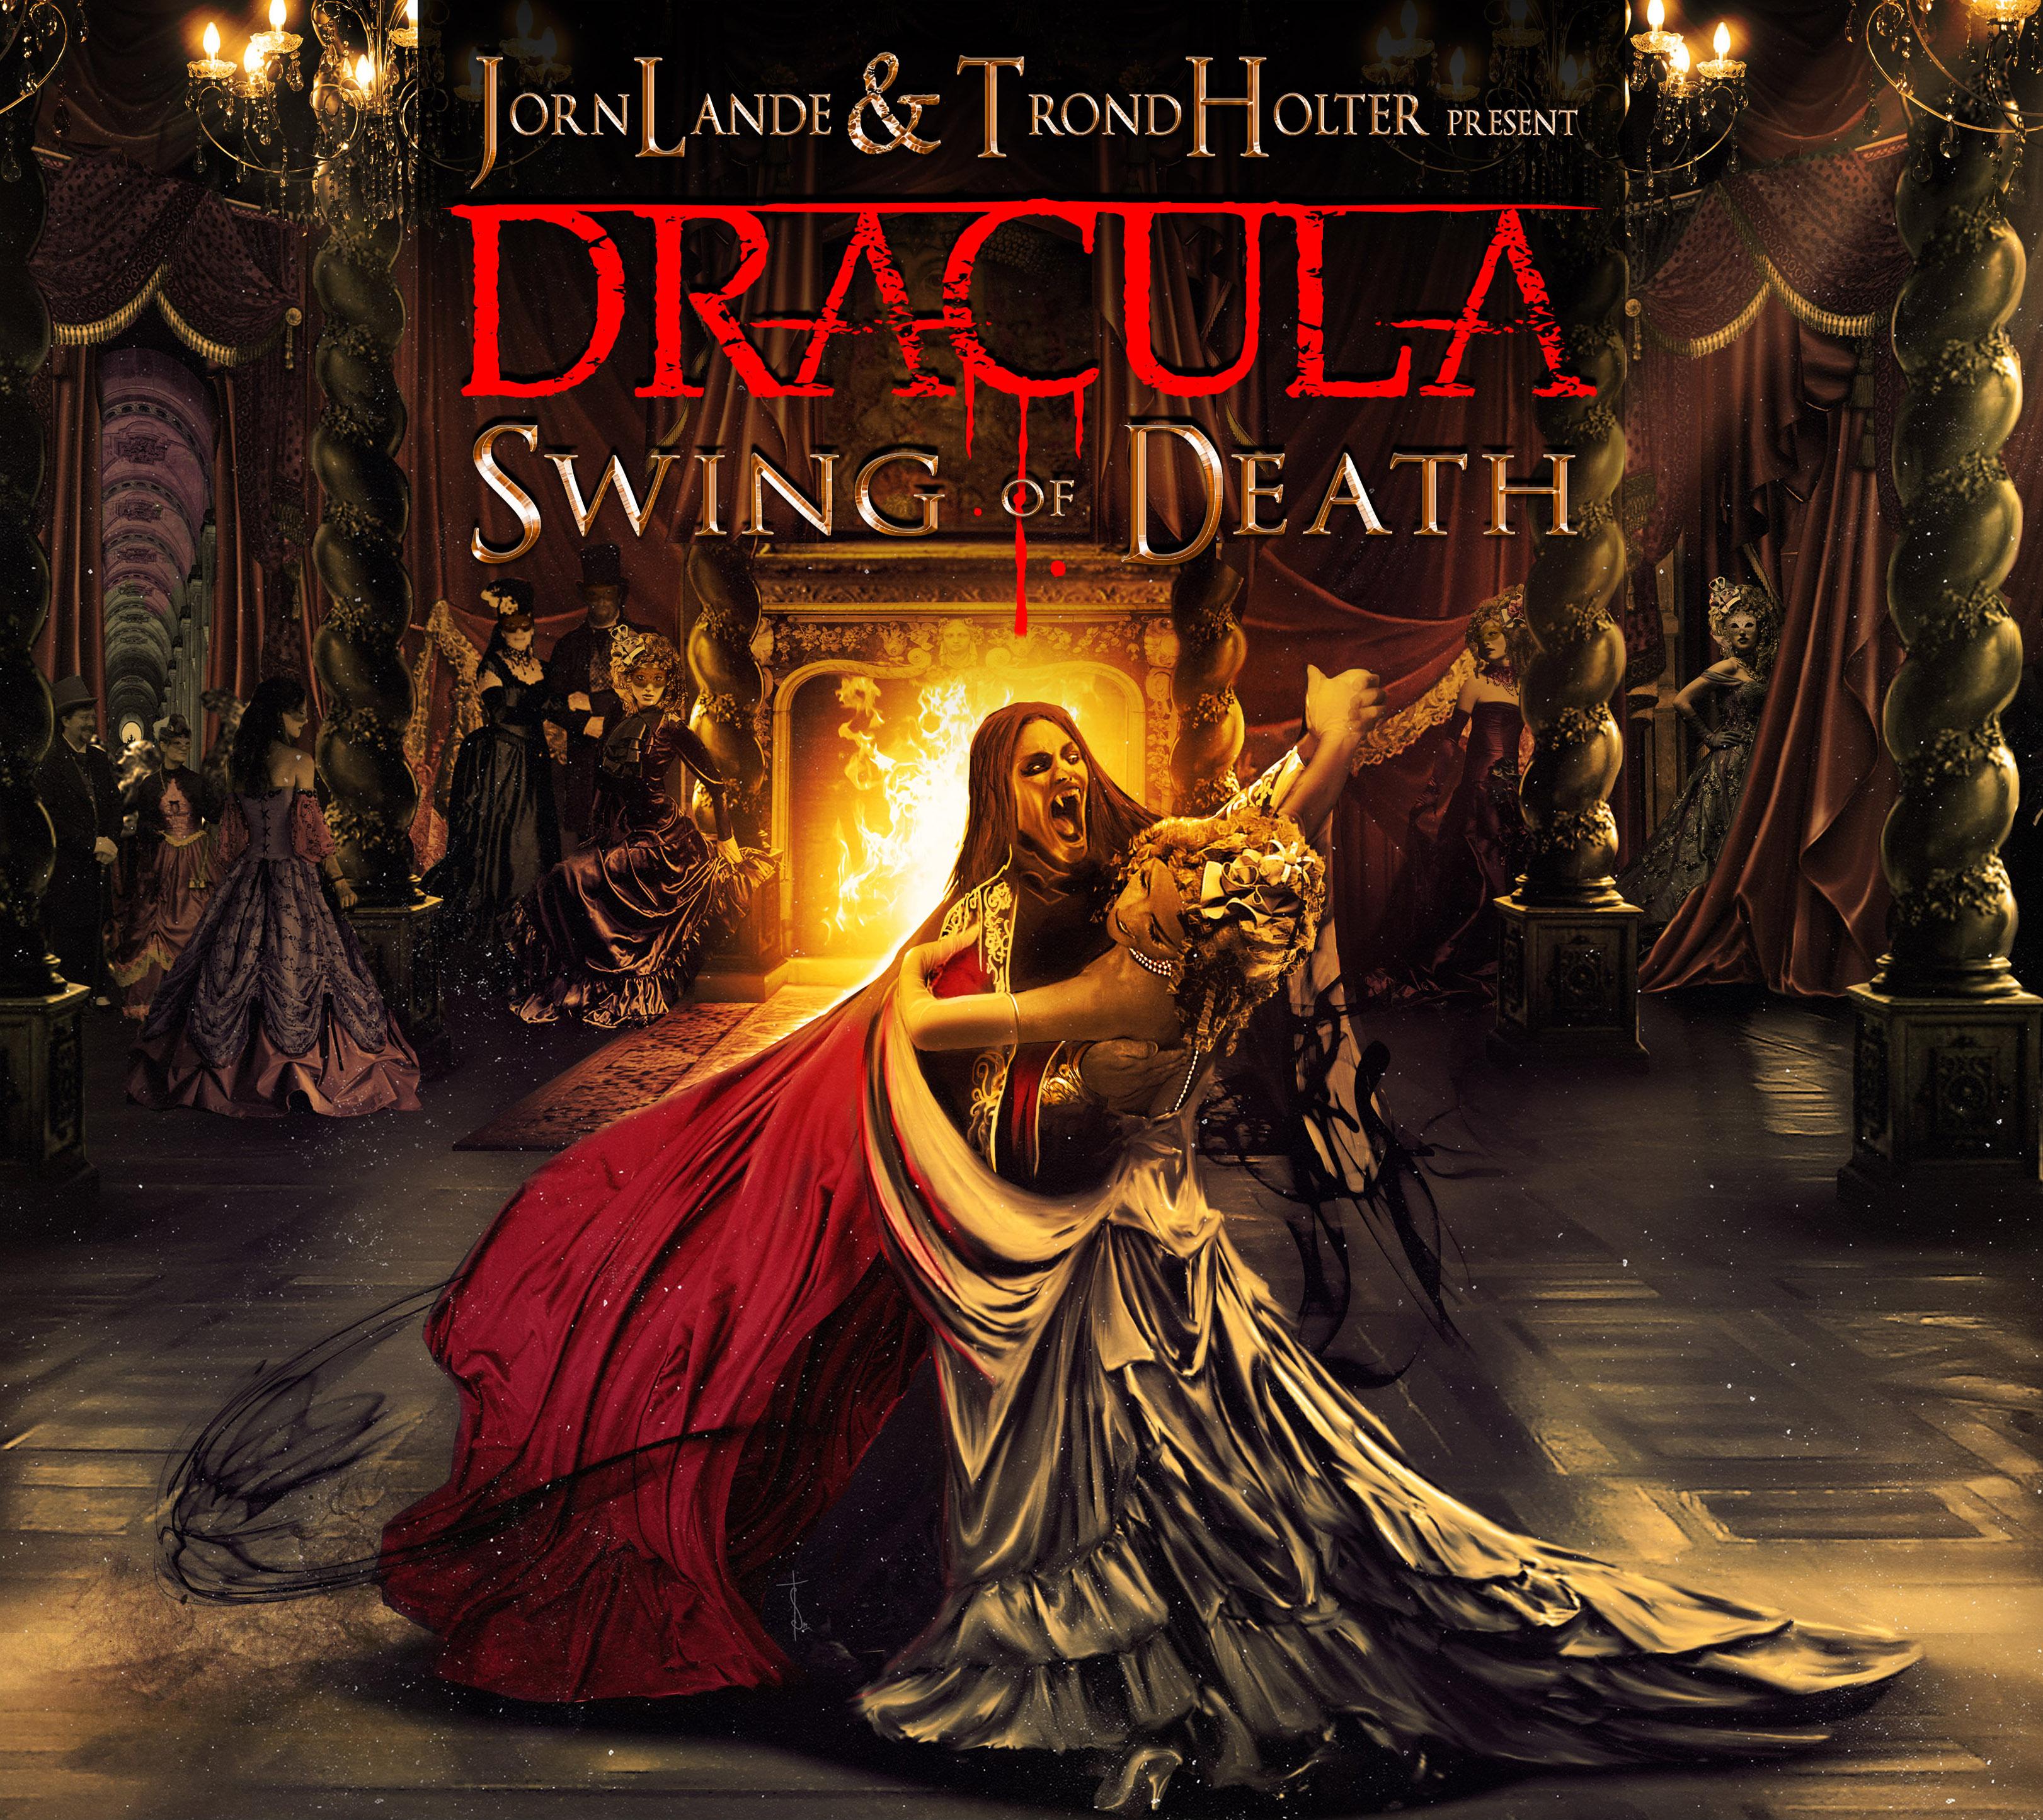 Die neuen Metal-Alben im Januar 2015 - Jorn Lande & Trond Holter Present DRACULA - SWING OF DEATH